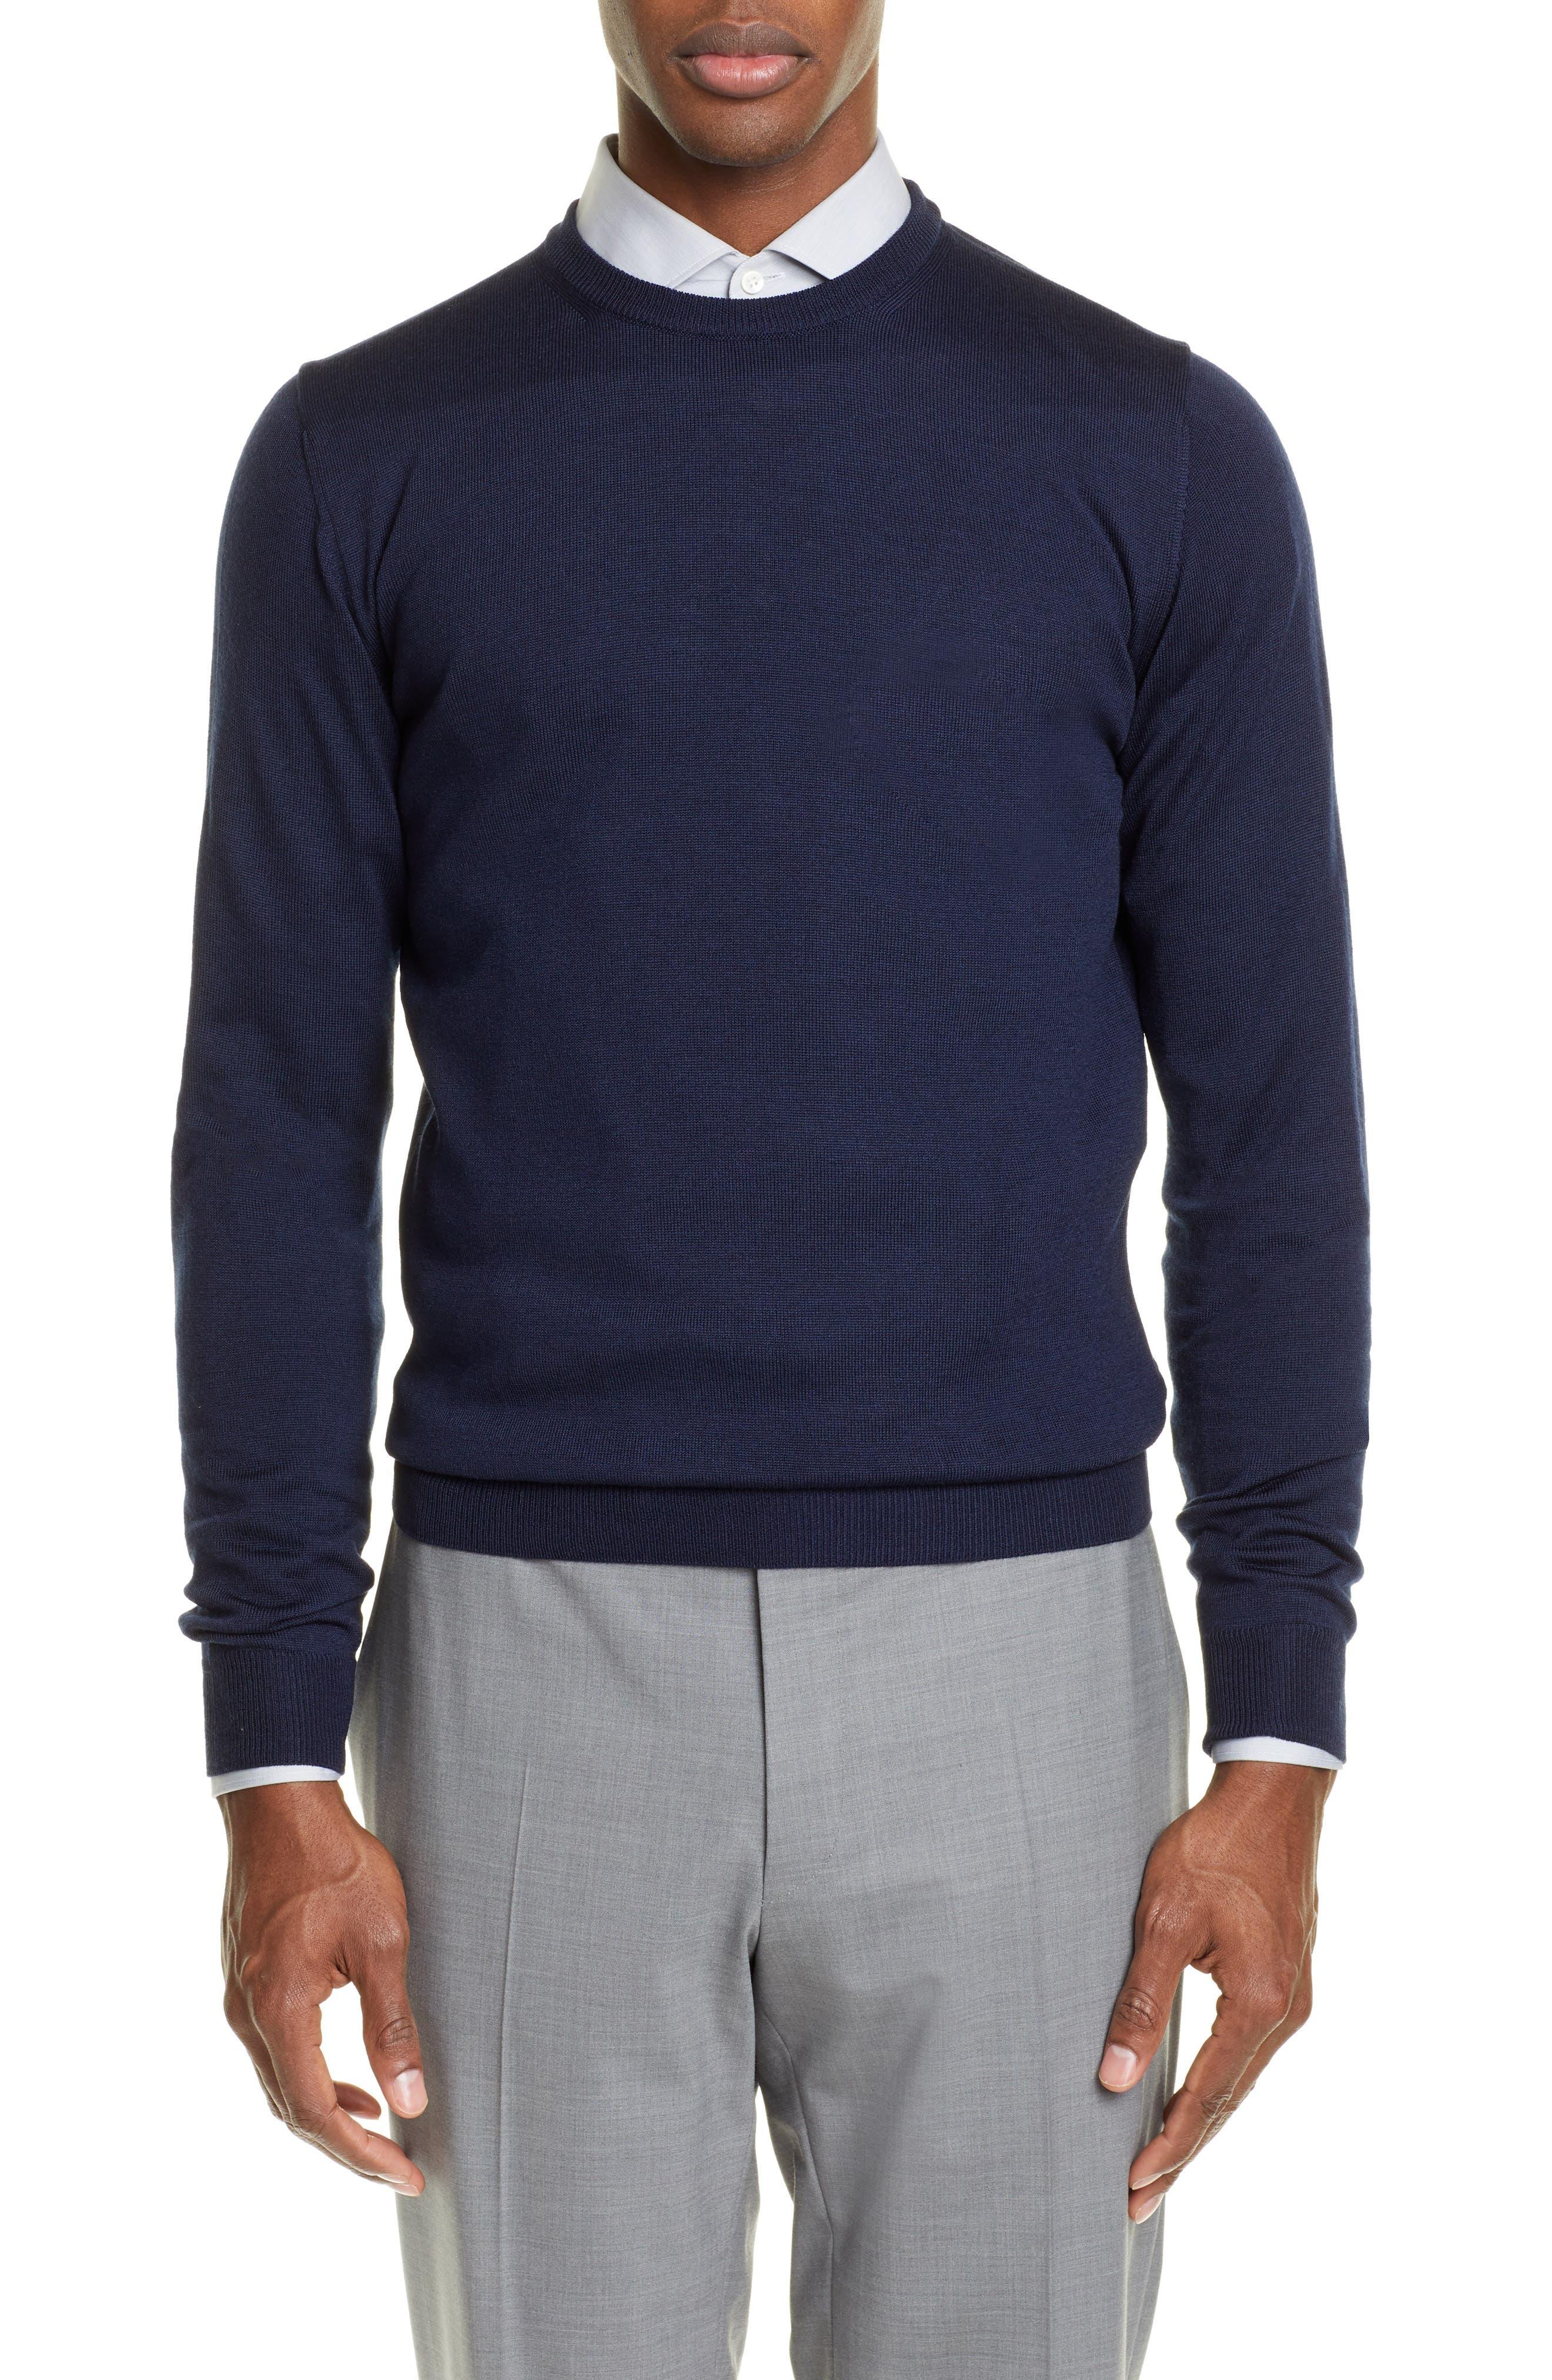 Editions Mr Stanislas Merino Wool Sweater, Blue